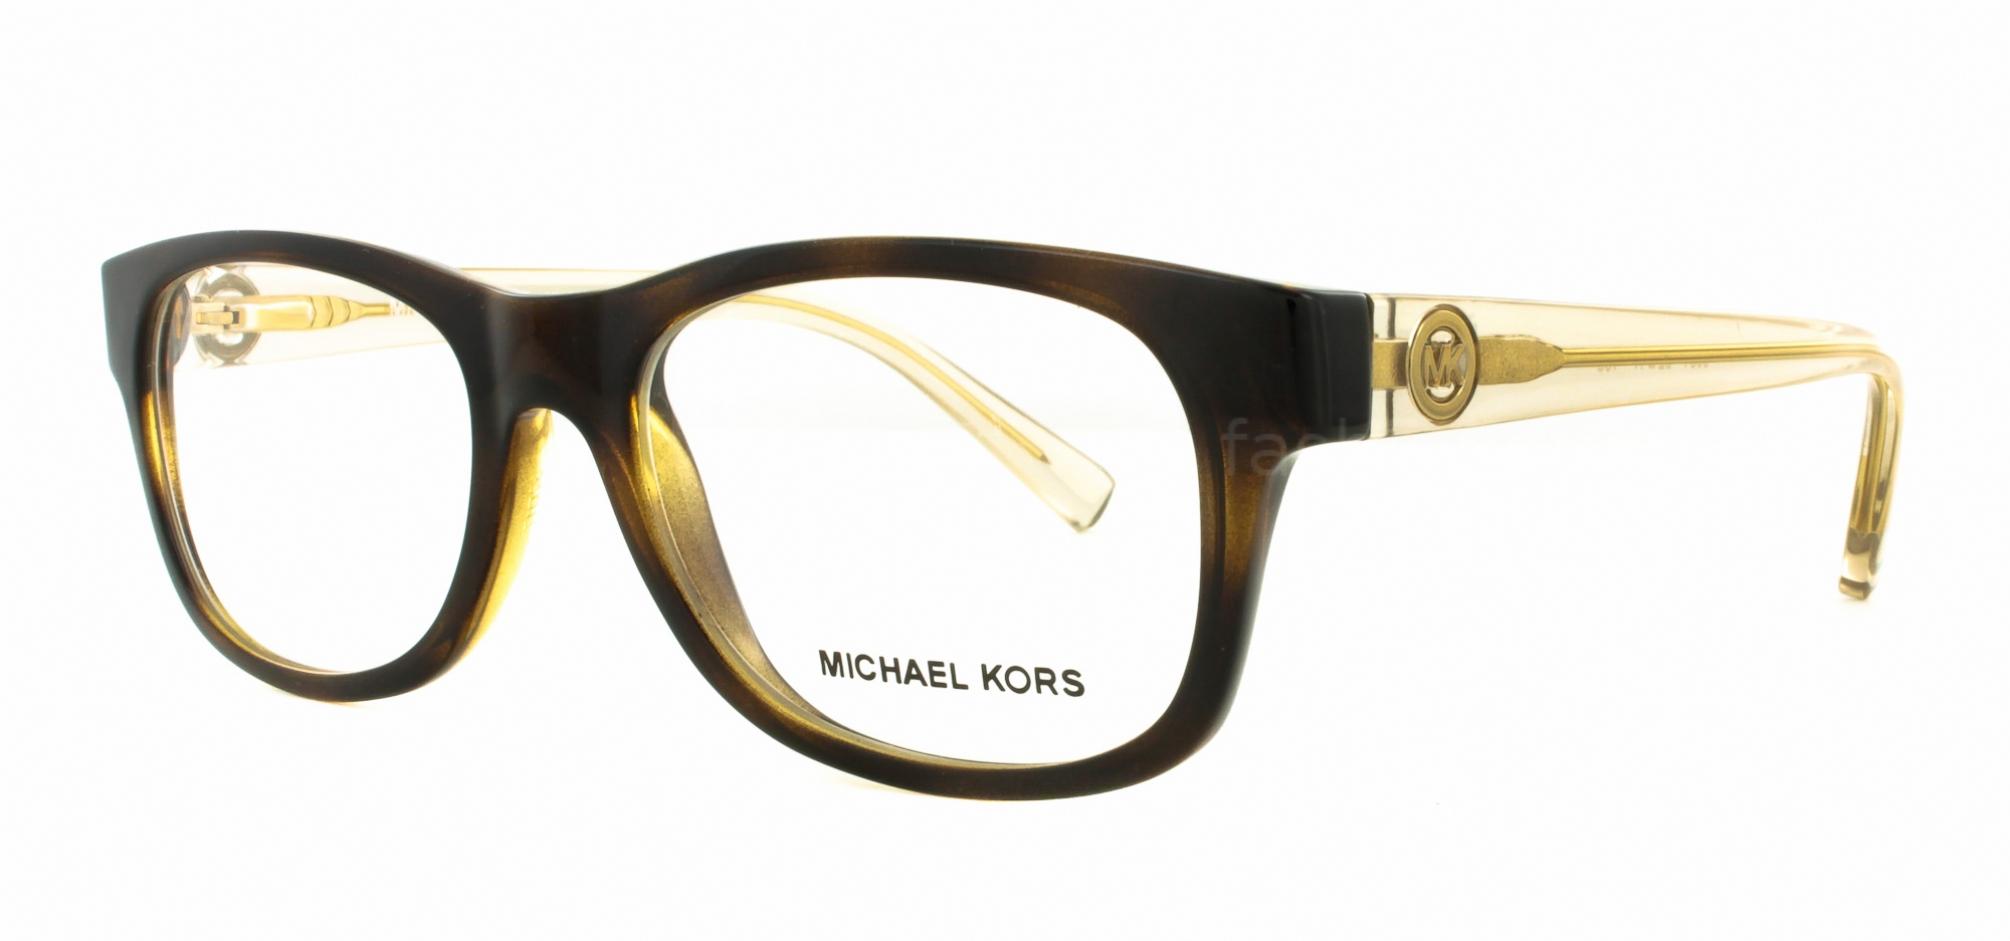 MICHAEL KORS SILVERLAKE 8014 in color 3054